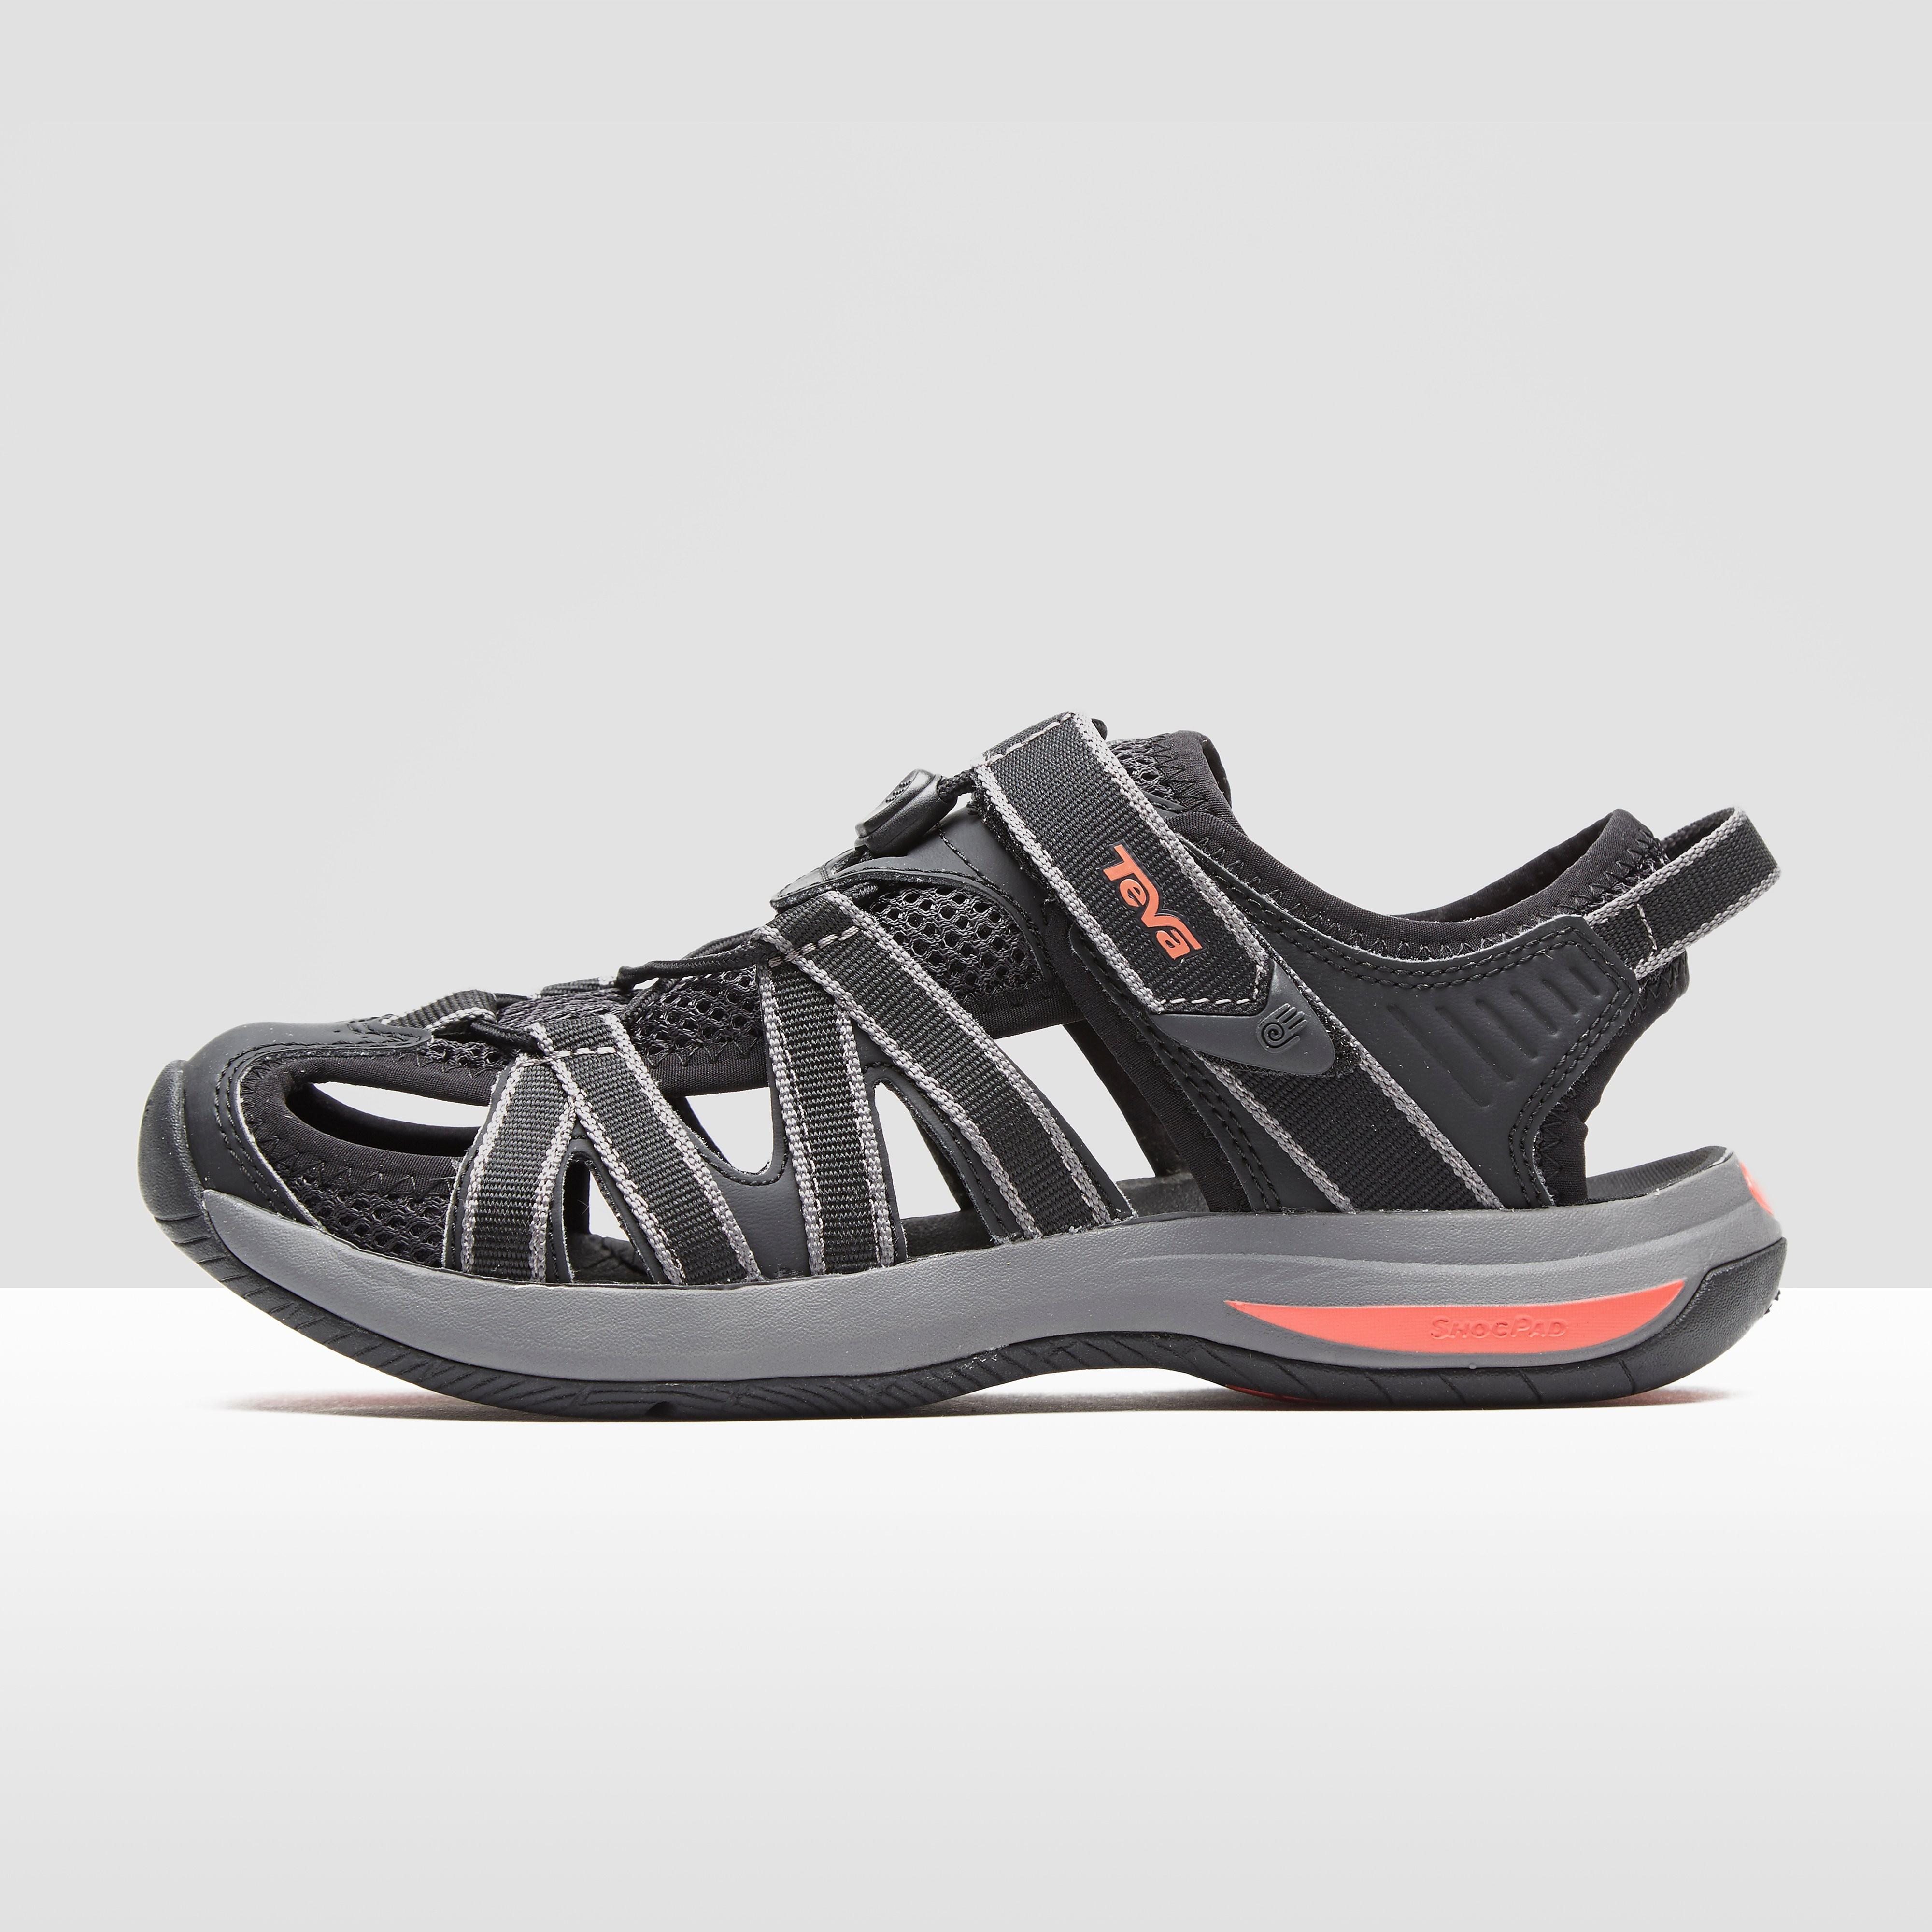 Teva Rosa Women's Sandals